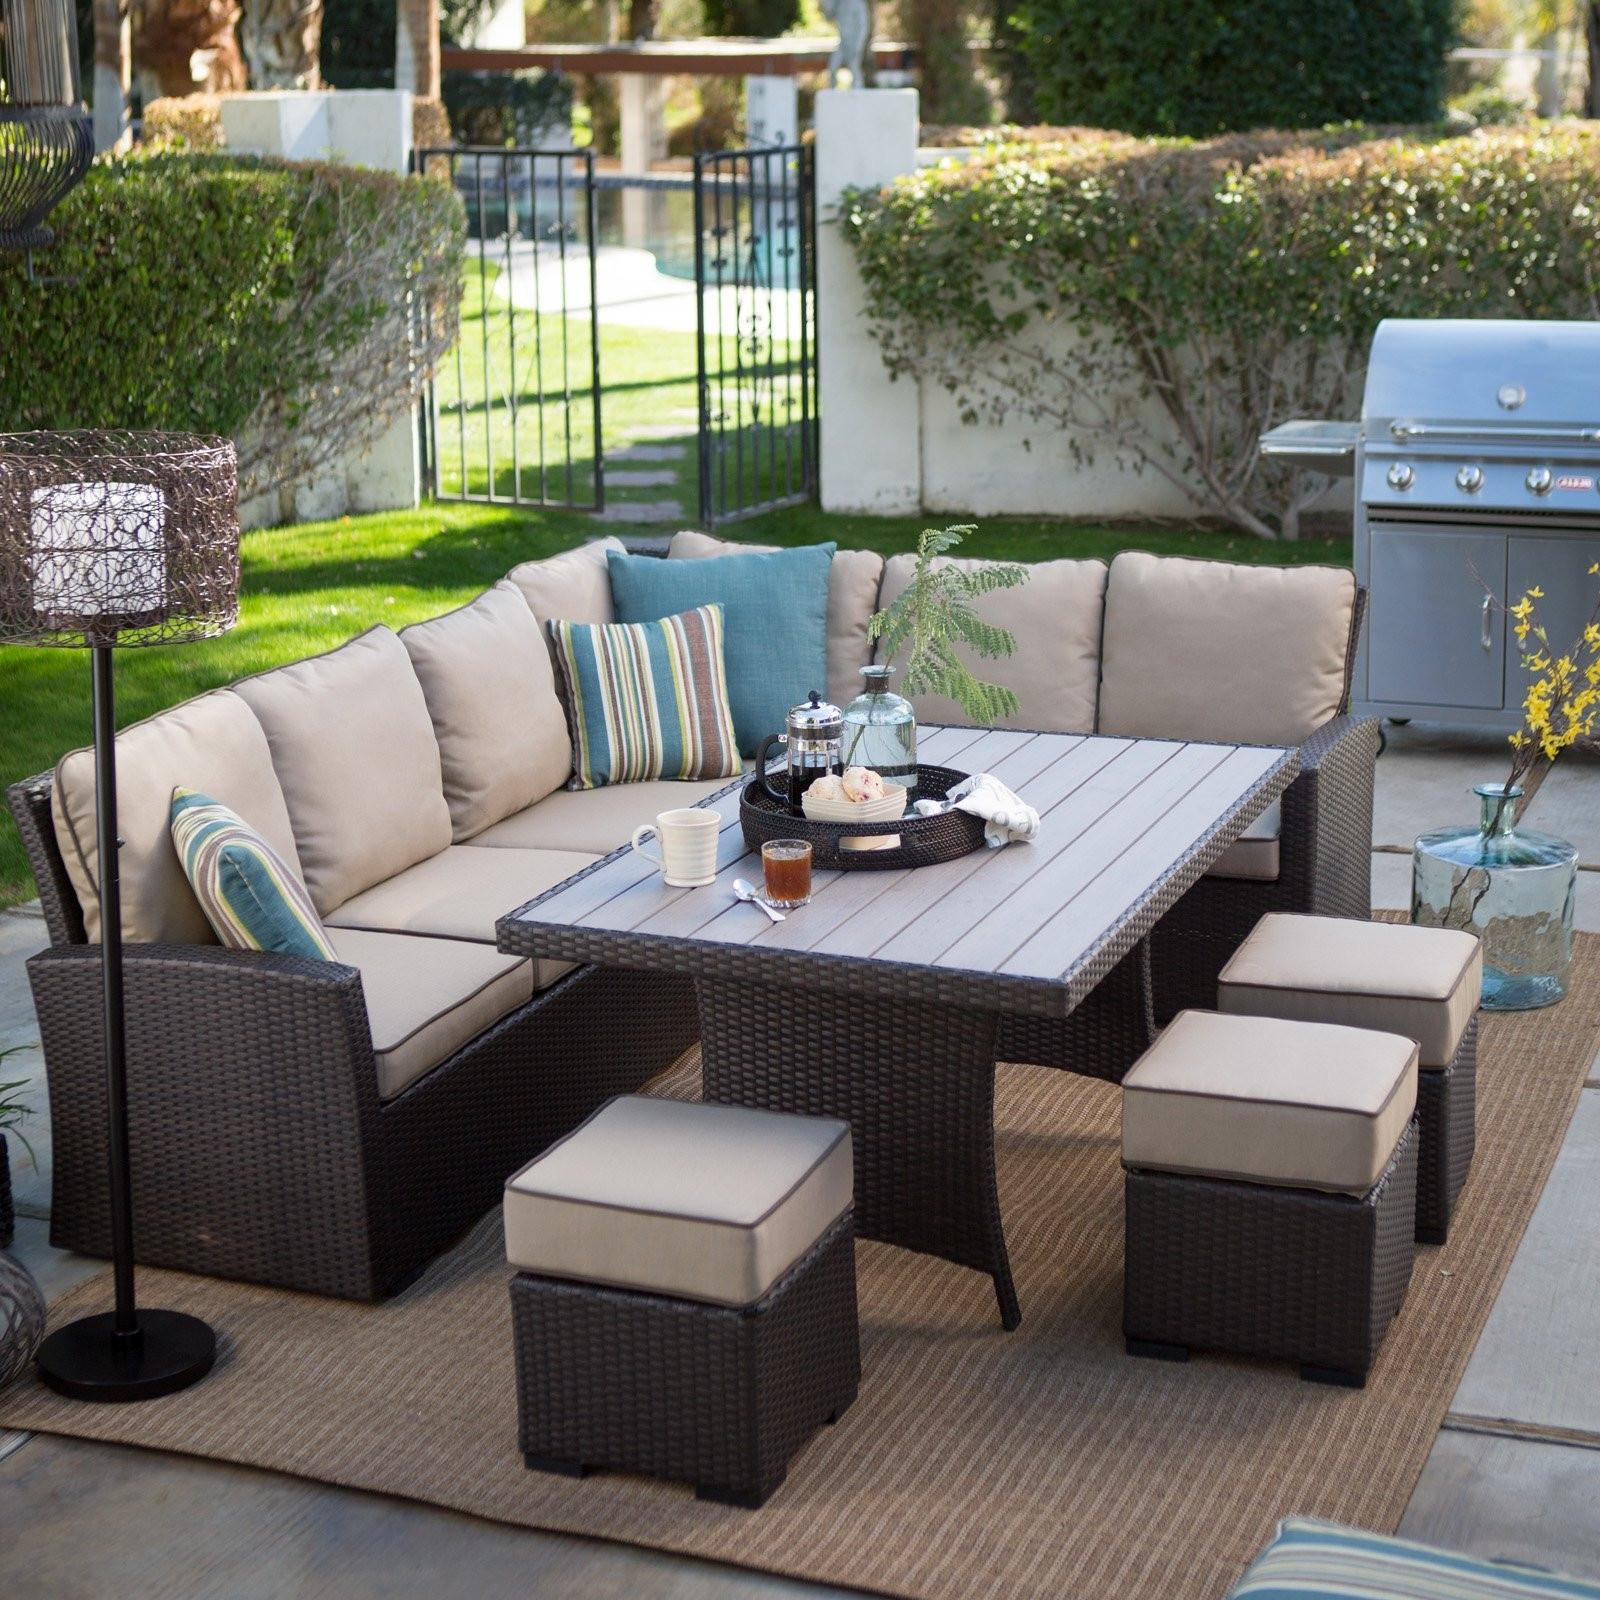 Best And Newest Wayfair Outdoor Patio Conversation Sets Intended For Wayfair Outdoor Conversation Sets Wayfair Outdoor Furniture (View 3 of 15)